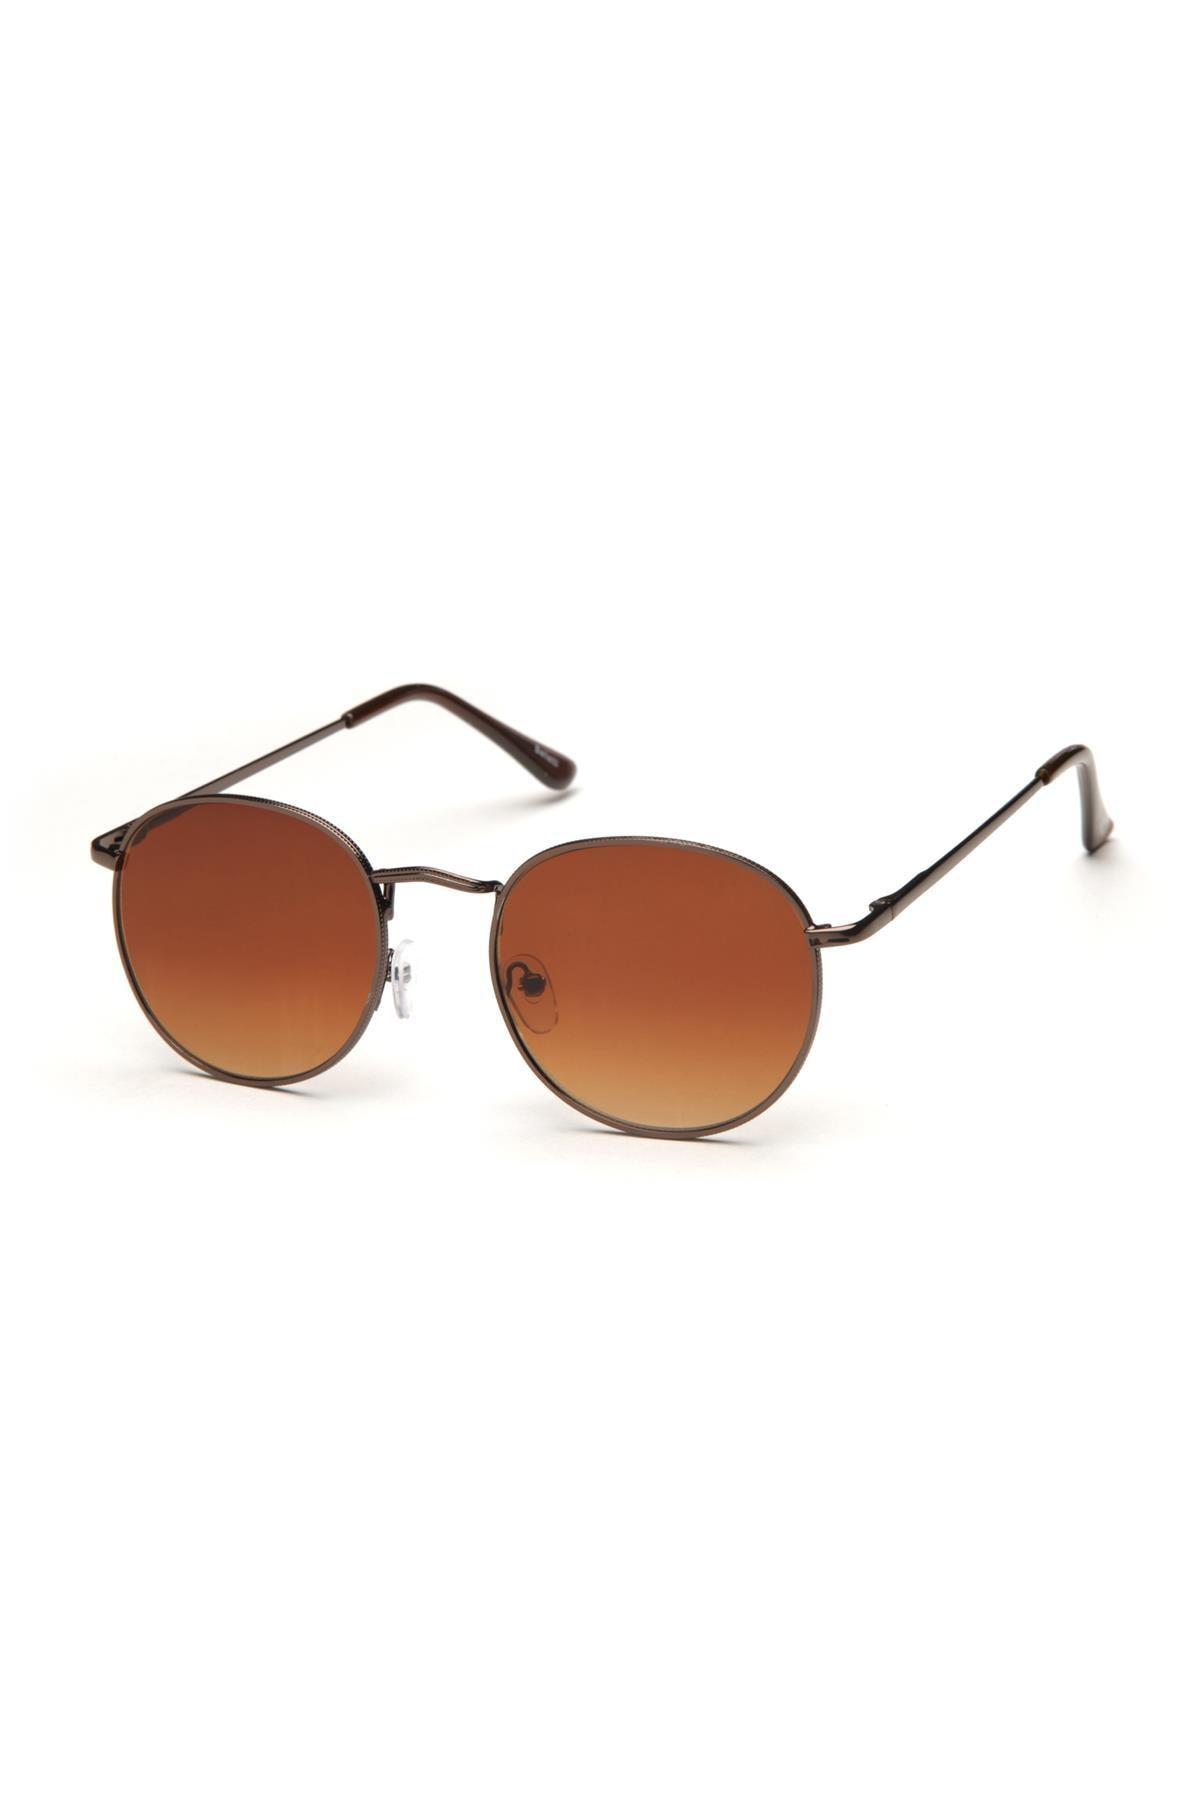 Di Caprio Unisex Yuvarlark Güneş Gözlüğü DH1568E